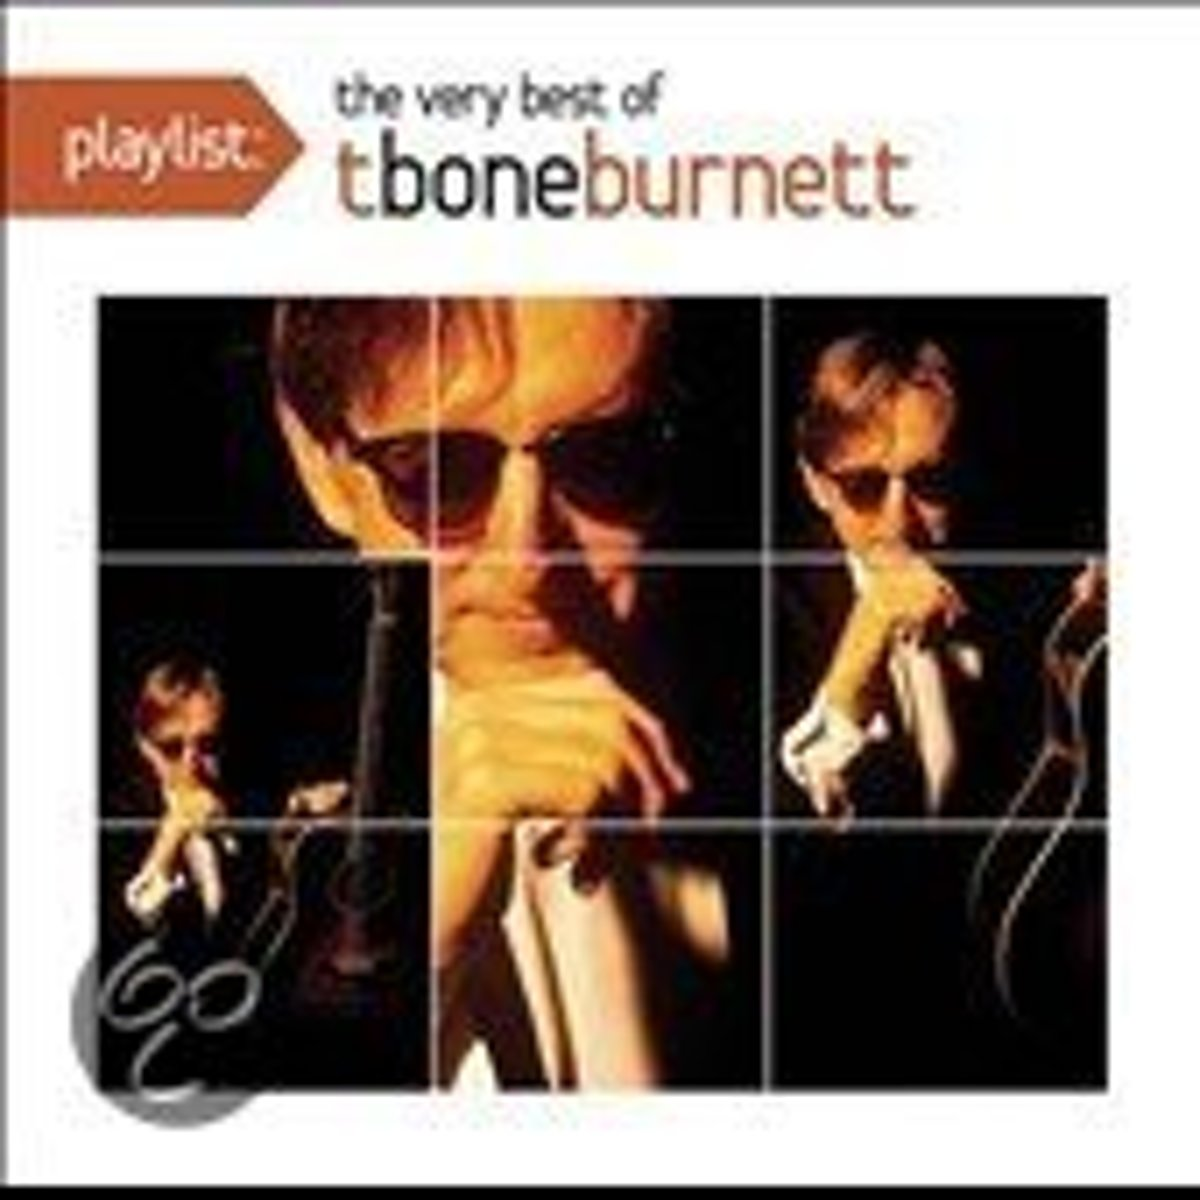 Afbeelding van product Playlist: The Very Best of T-Bone Burnett